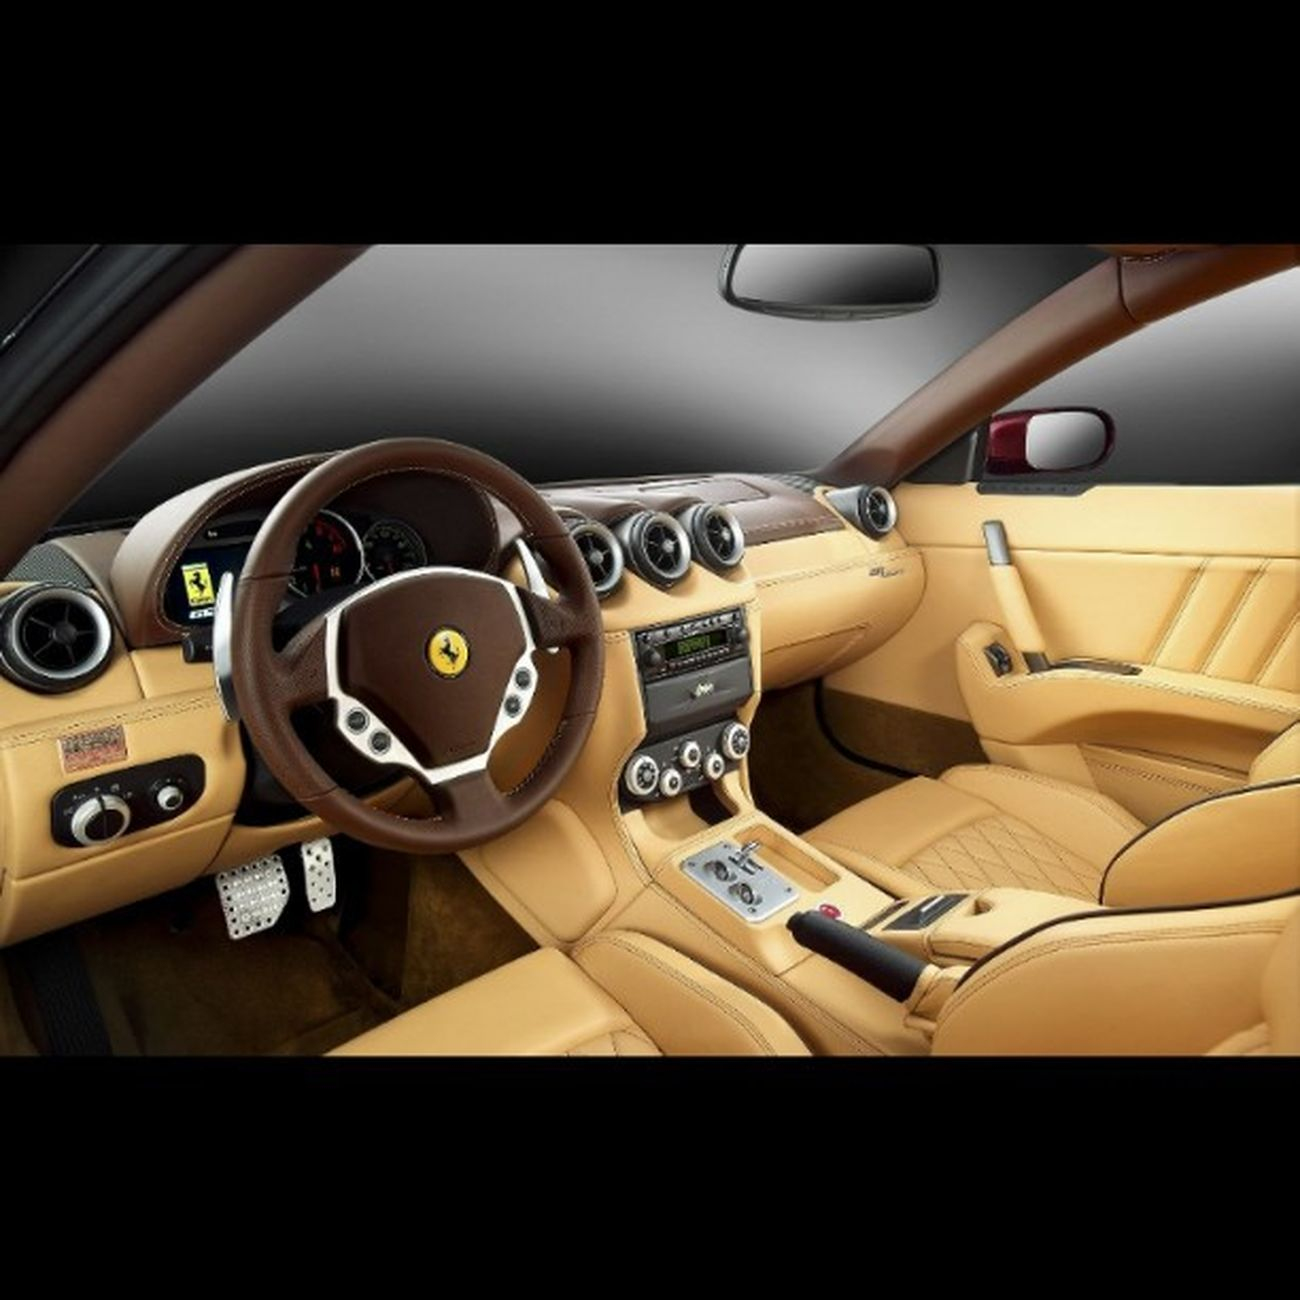 Ferrari Friday! Ferrari Ferrariworld Ferrarifriday Yrflifestyle